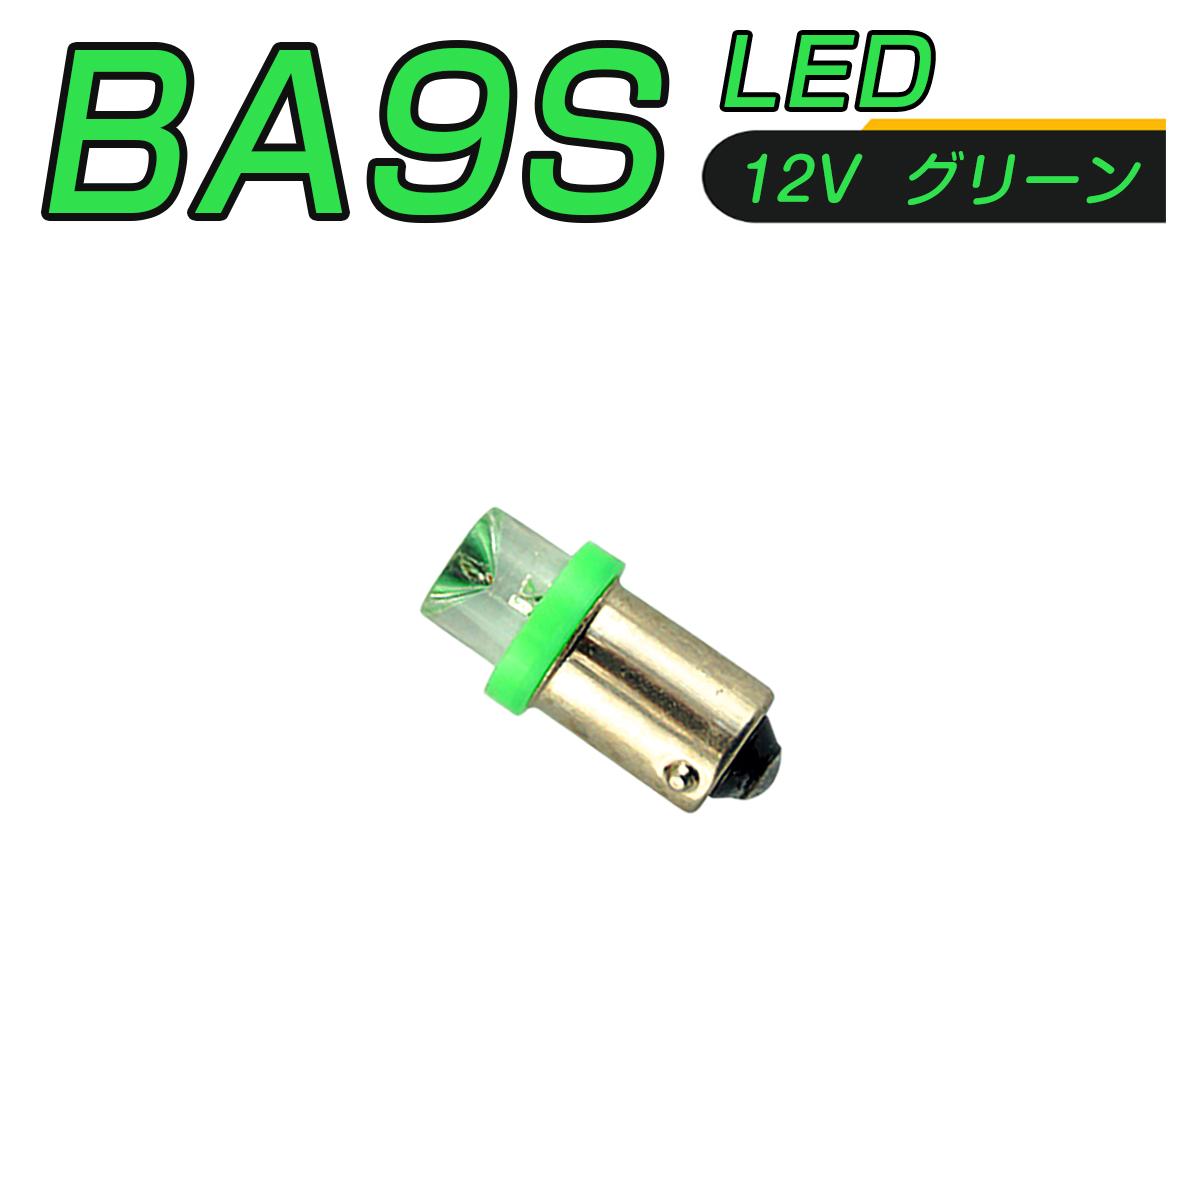 LED 口金 BA9S 緑 メーター球 タコランプ インジケーター エアコンパネル 超拡散 全面発光 2個セット SDM便送料無料 1ヶ月保証